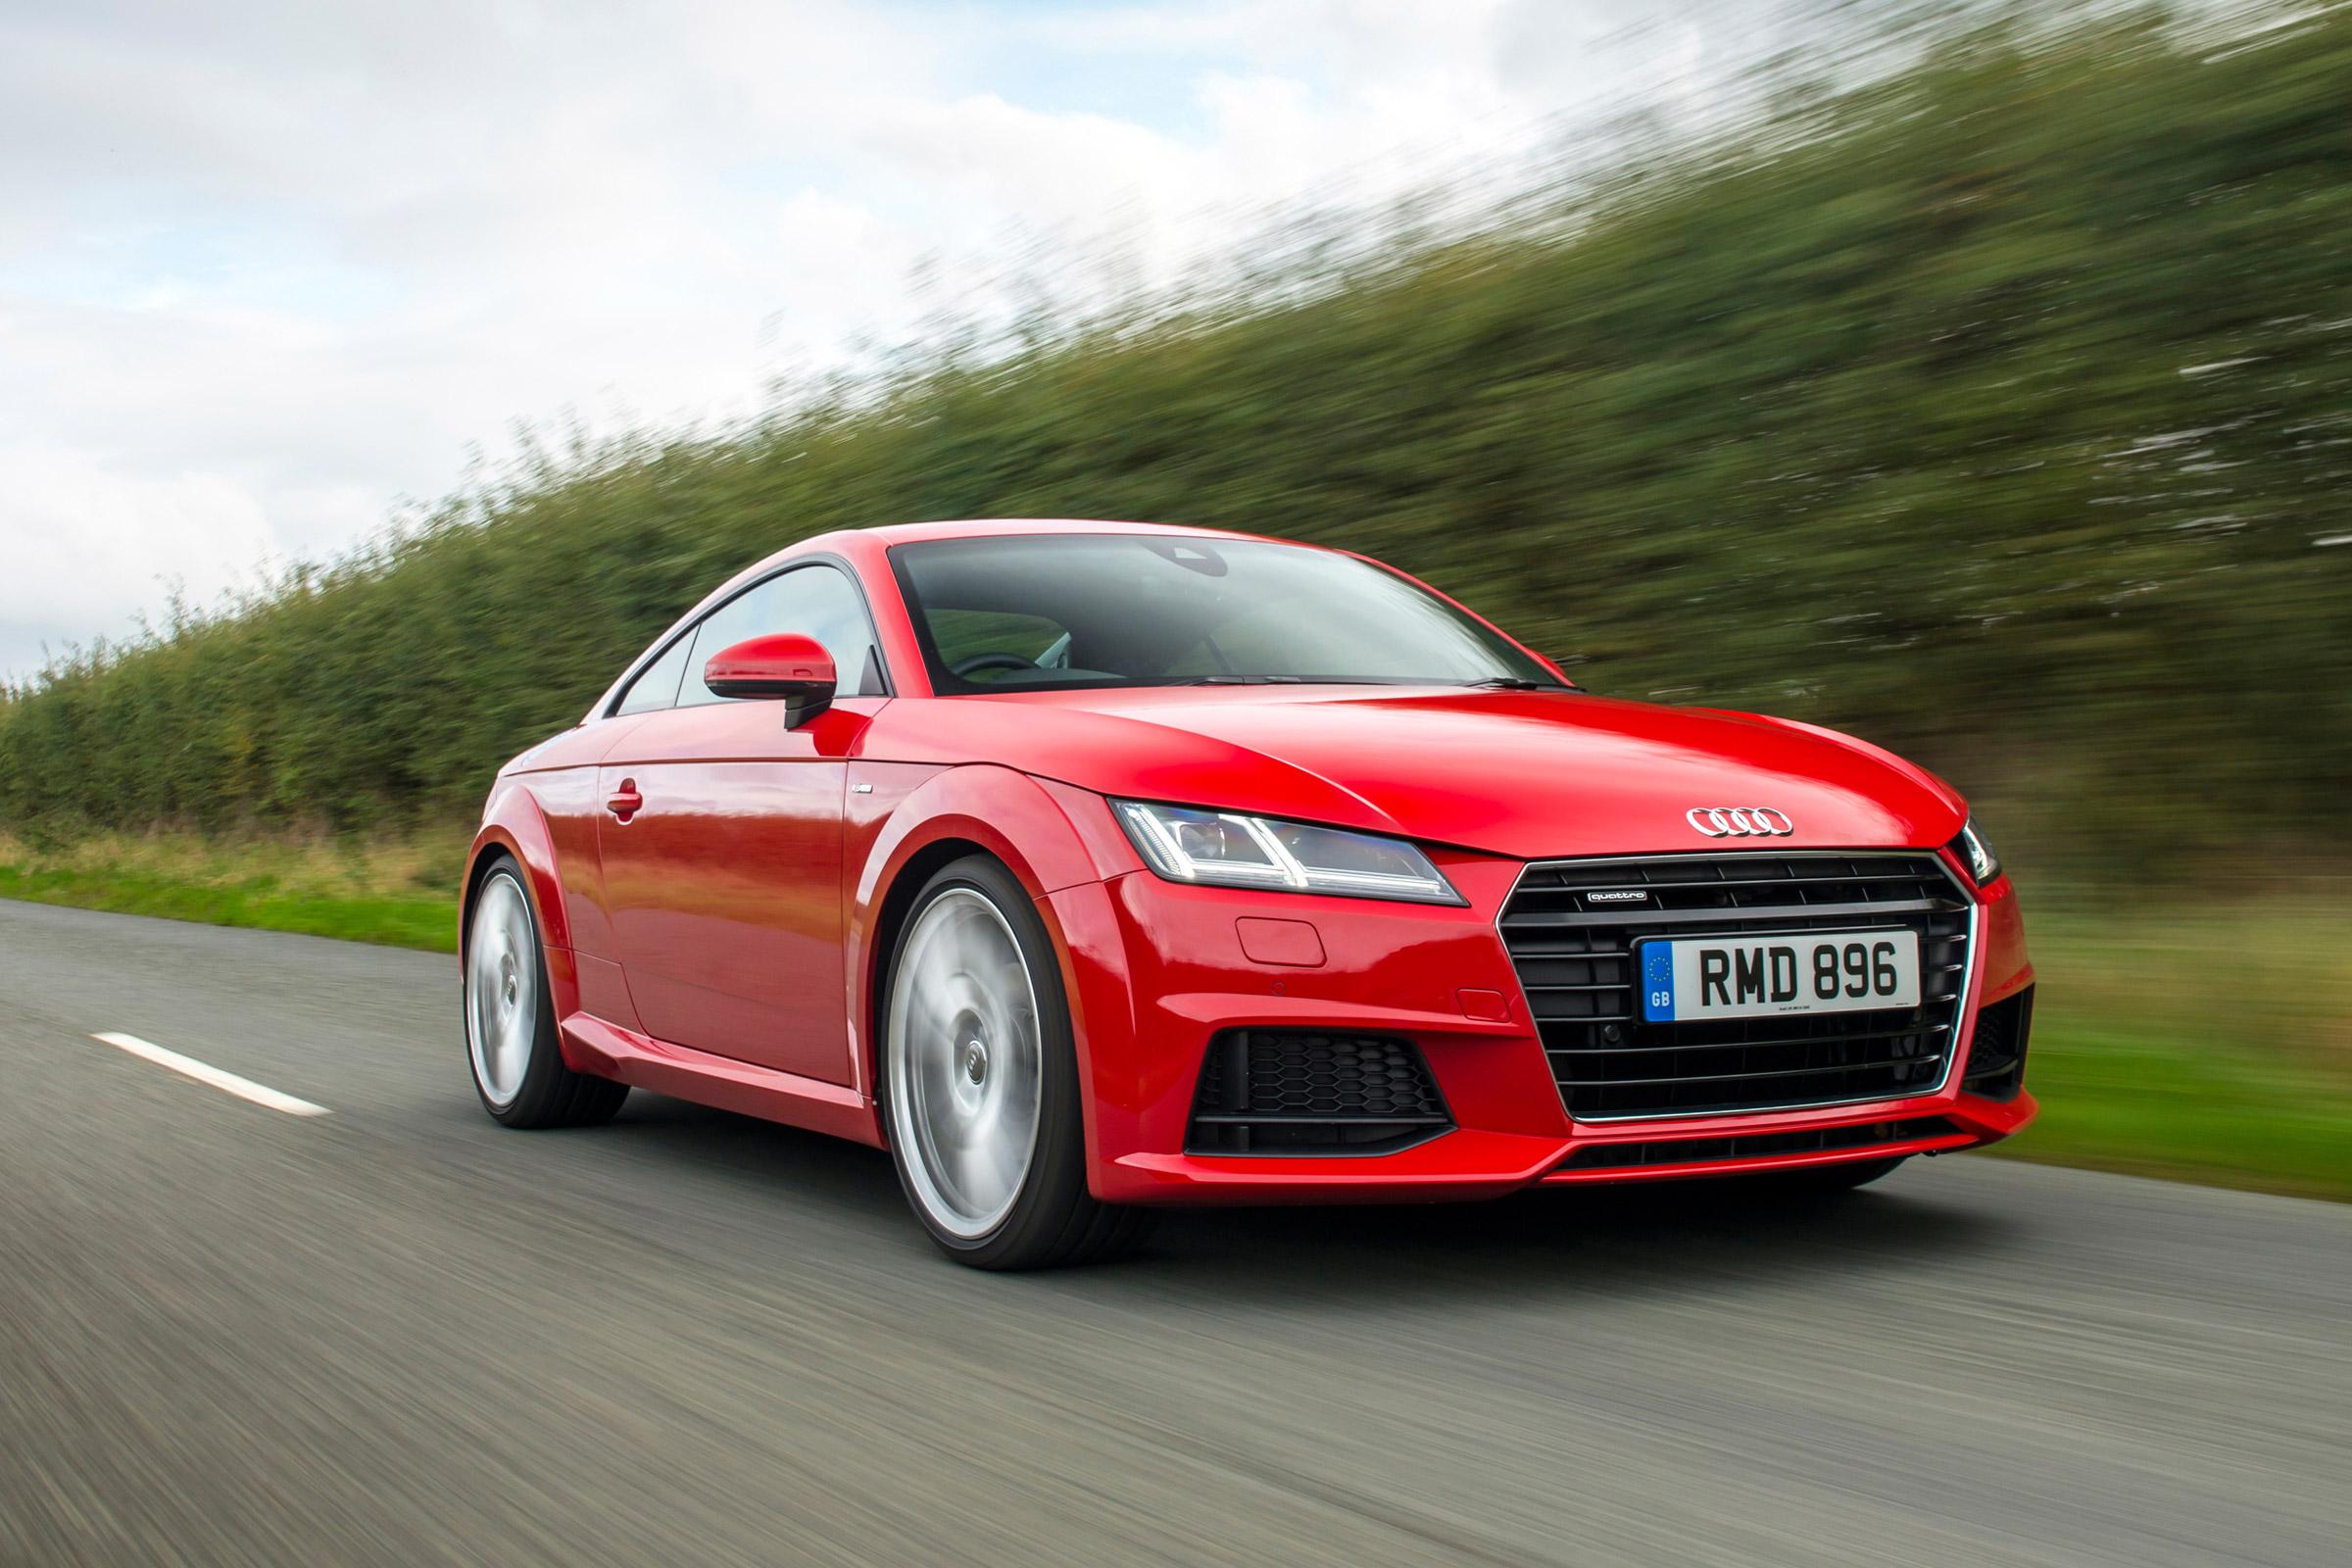 Audi TT 2.0 TFSI quattro 2015 review | Auto Express